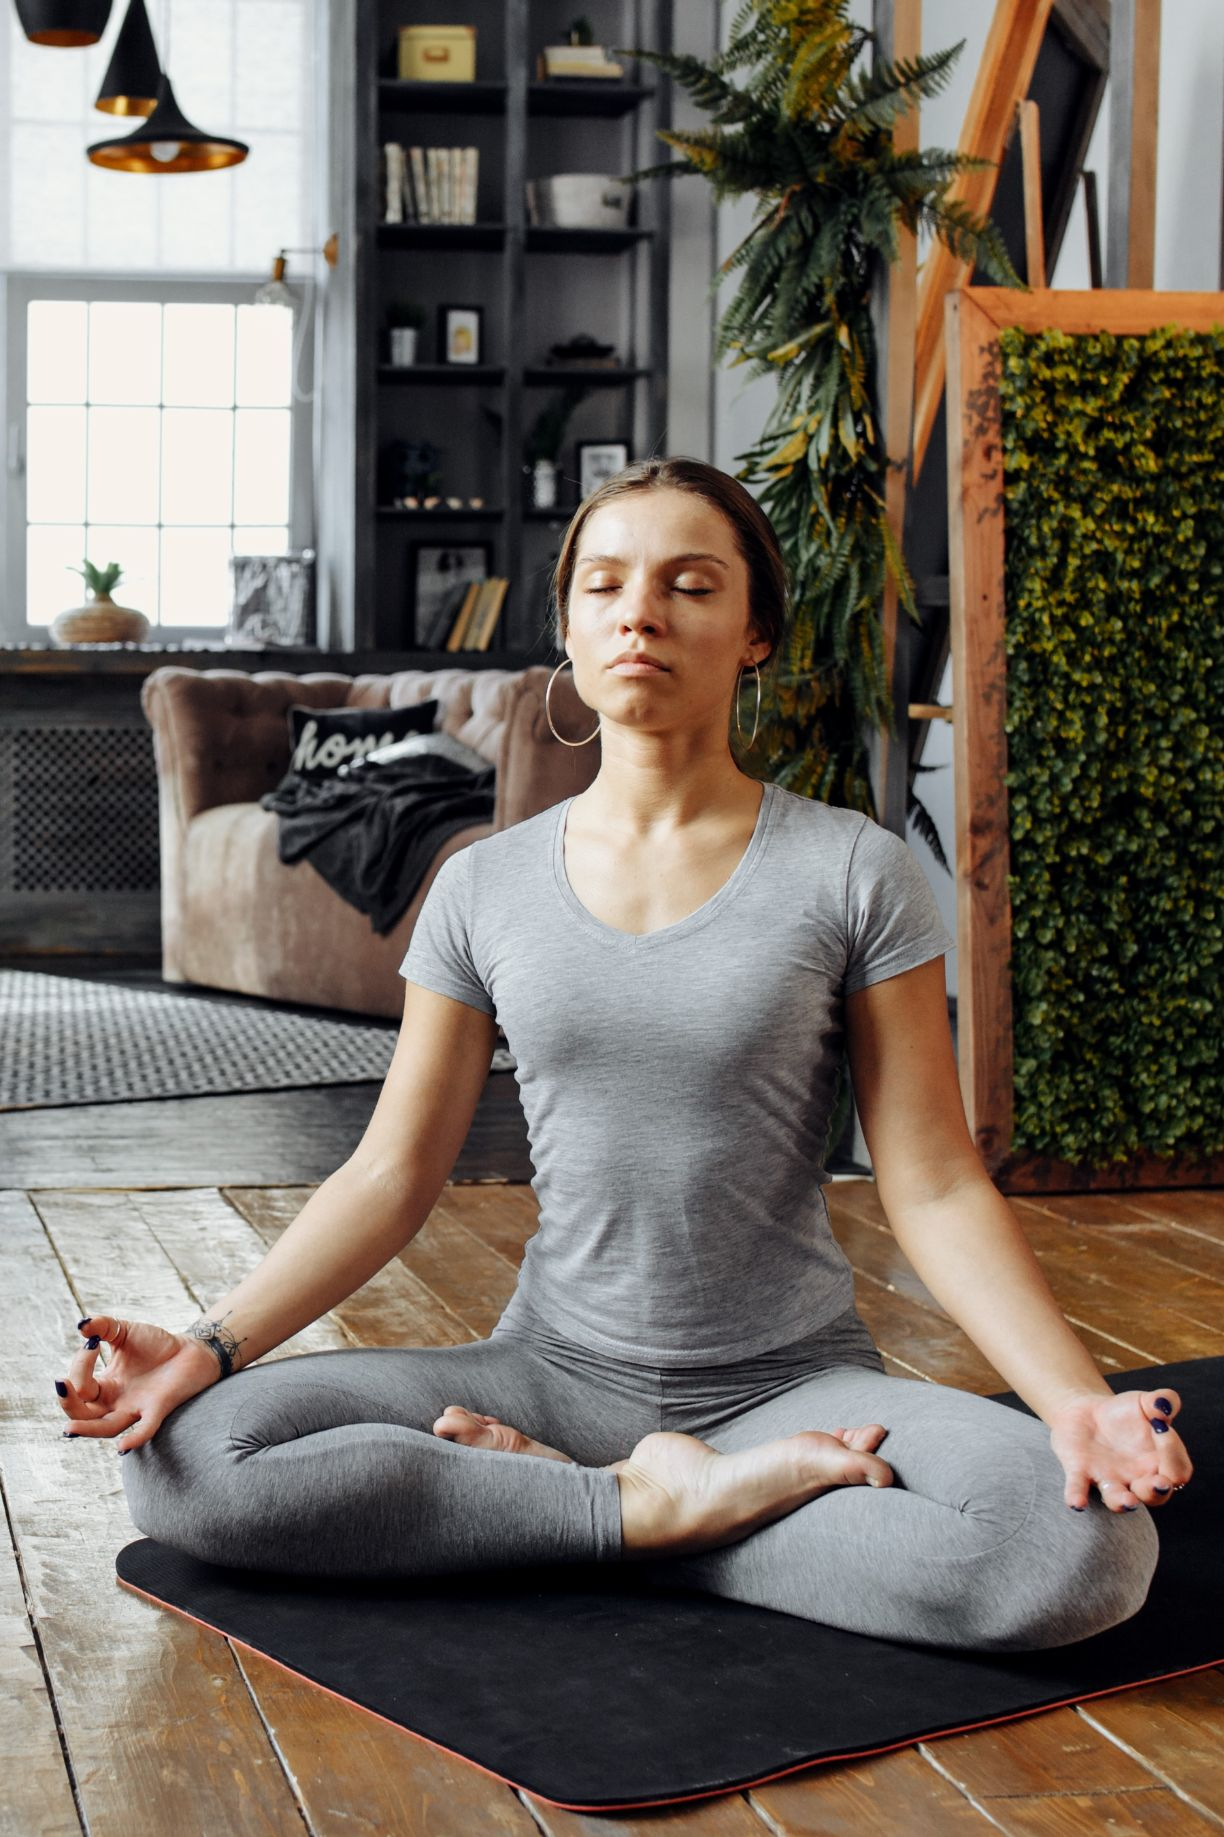 Meditierende Person in Sitzposition